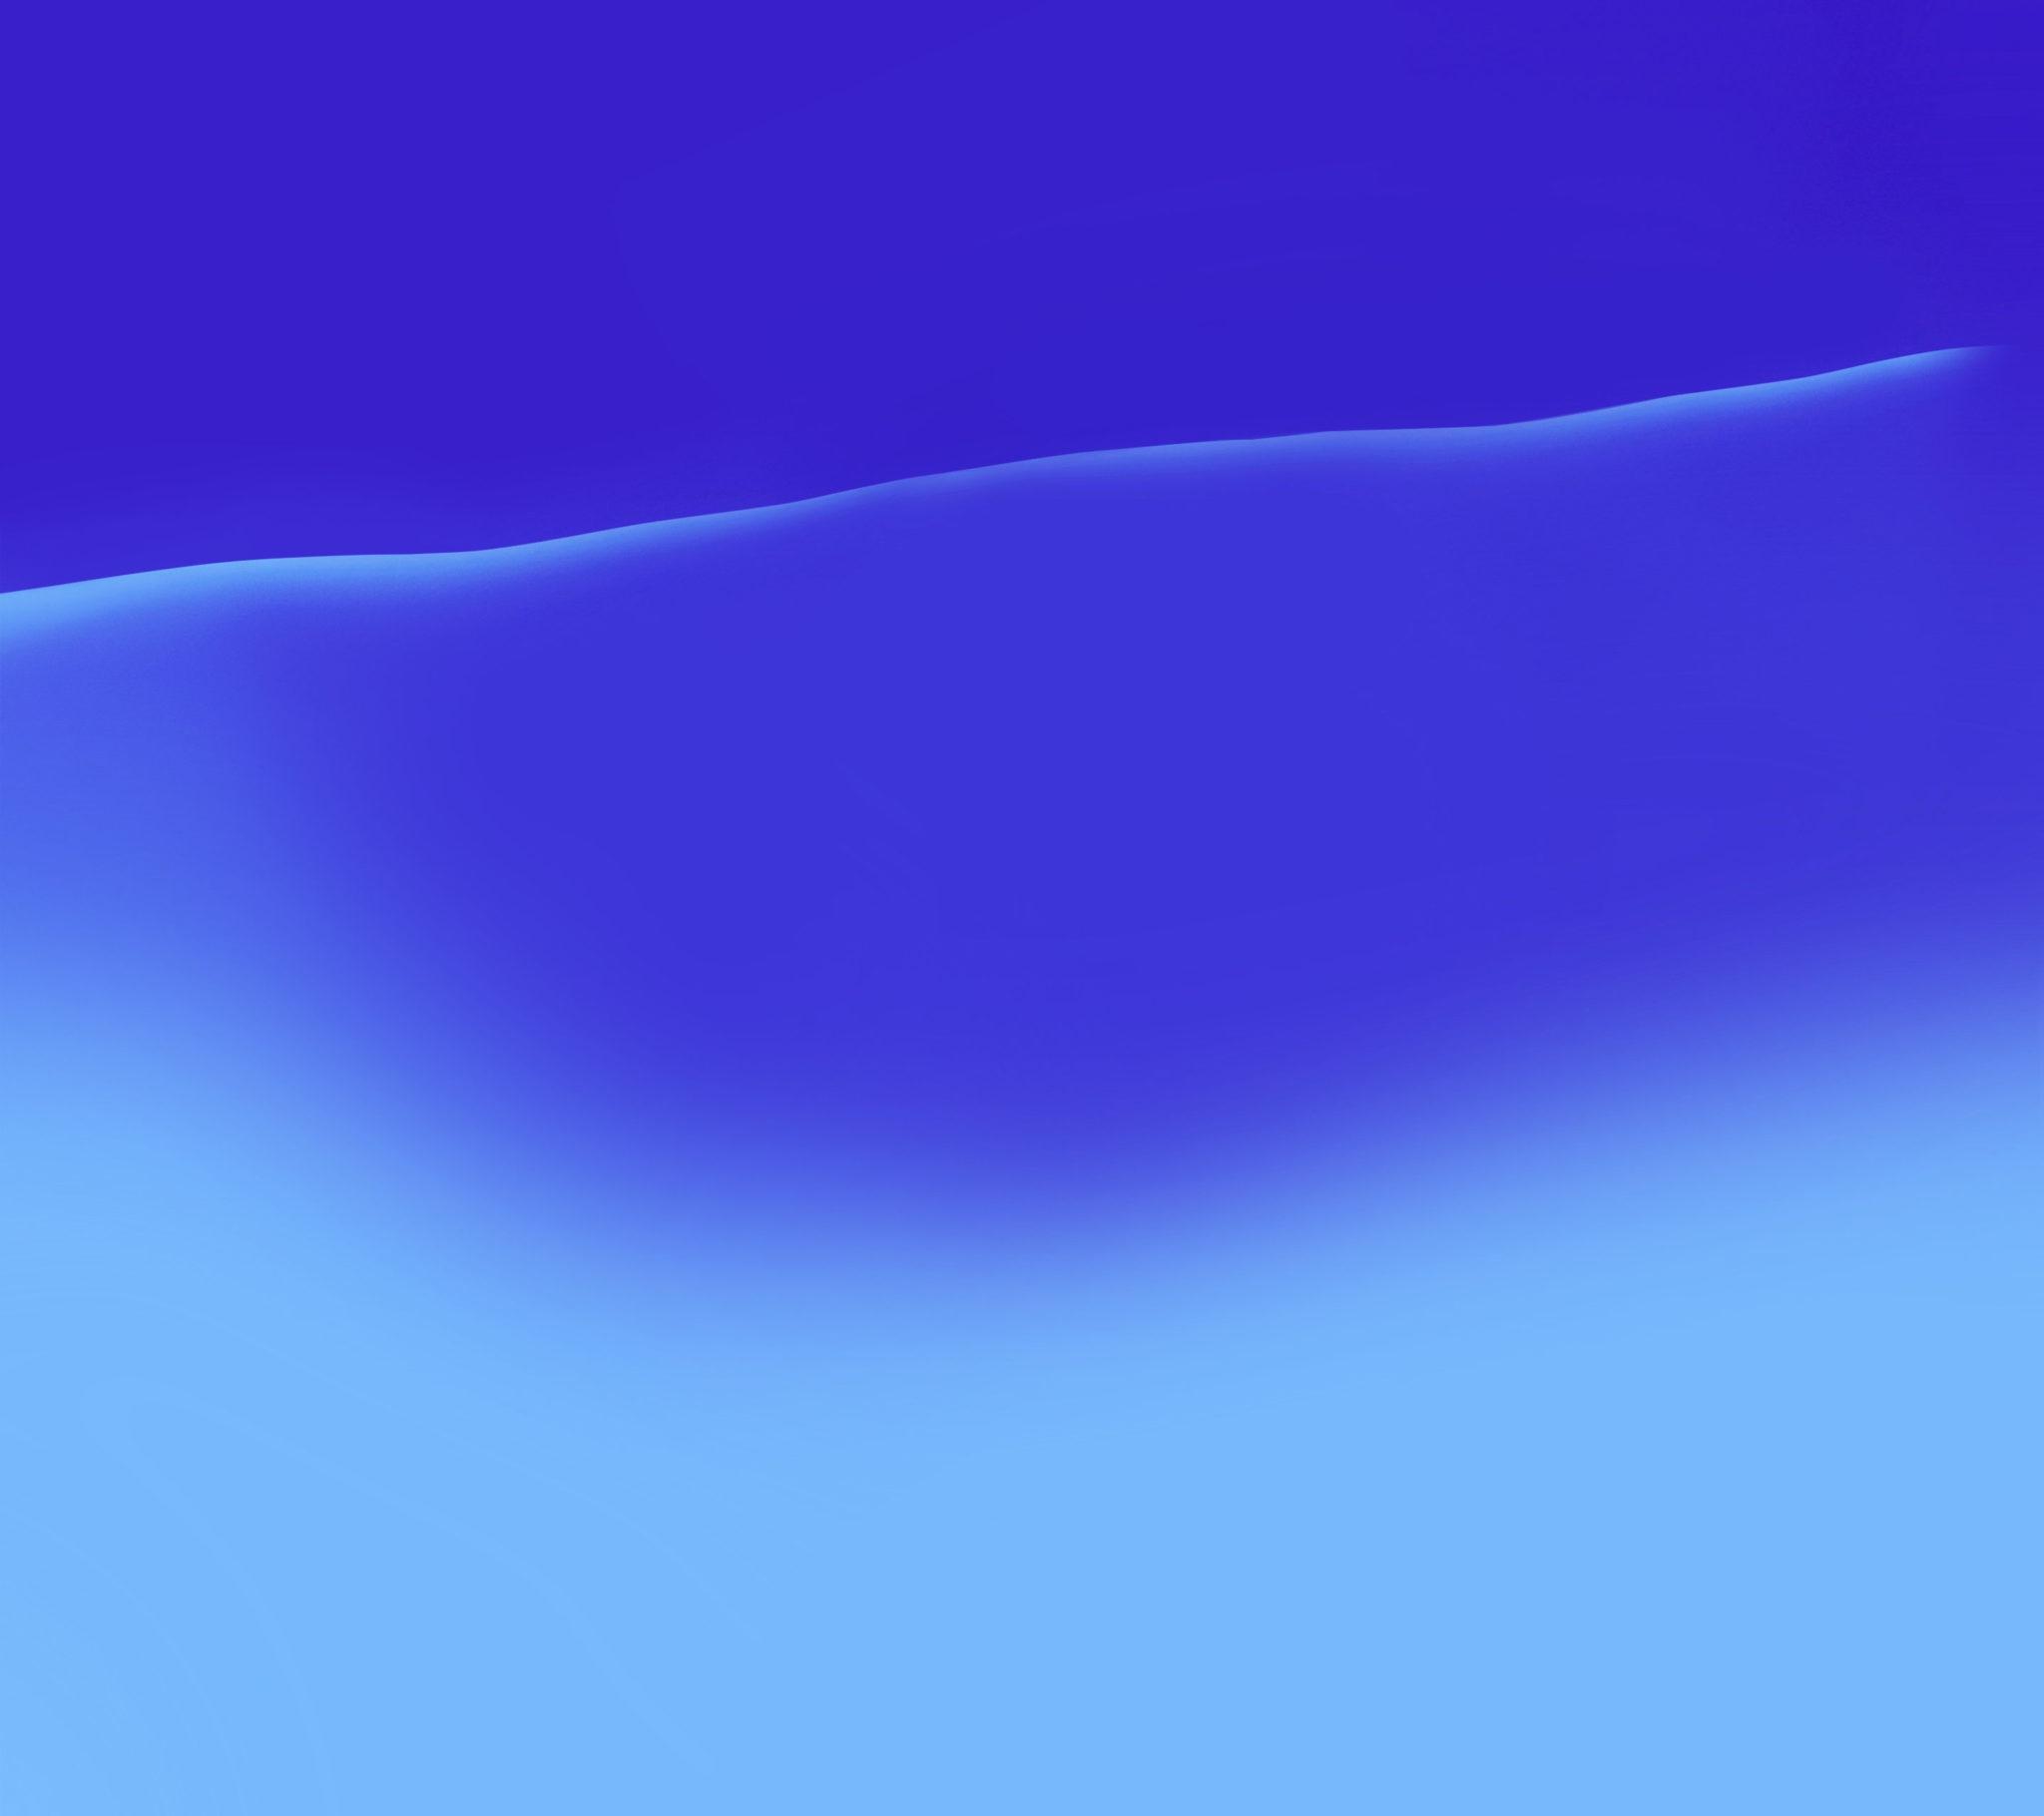 Google Live Wallpaper: Download Nexus 5P Sailfish HD Stock Wallpapers